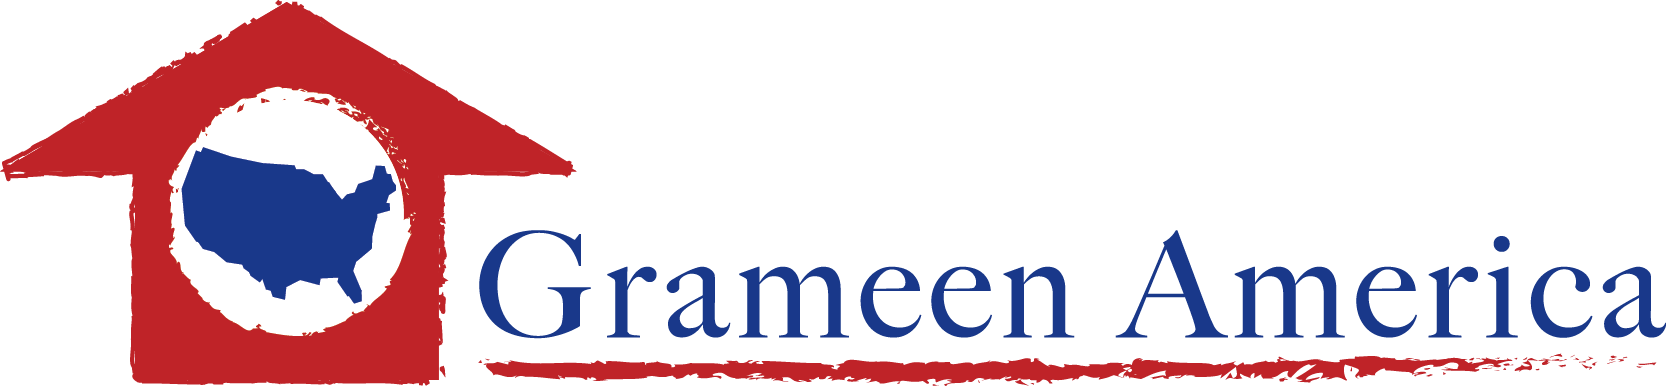 grameen-america-logo_no-background